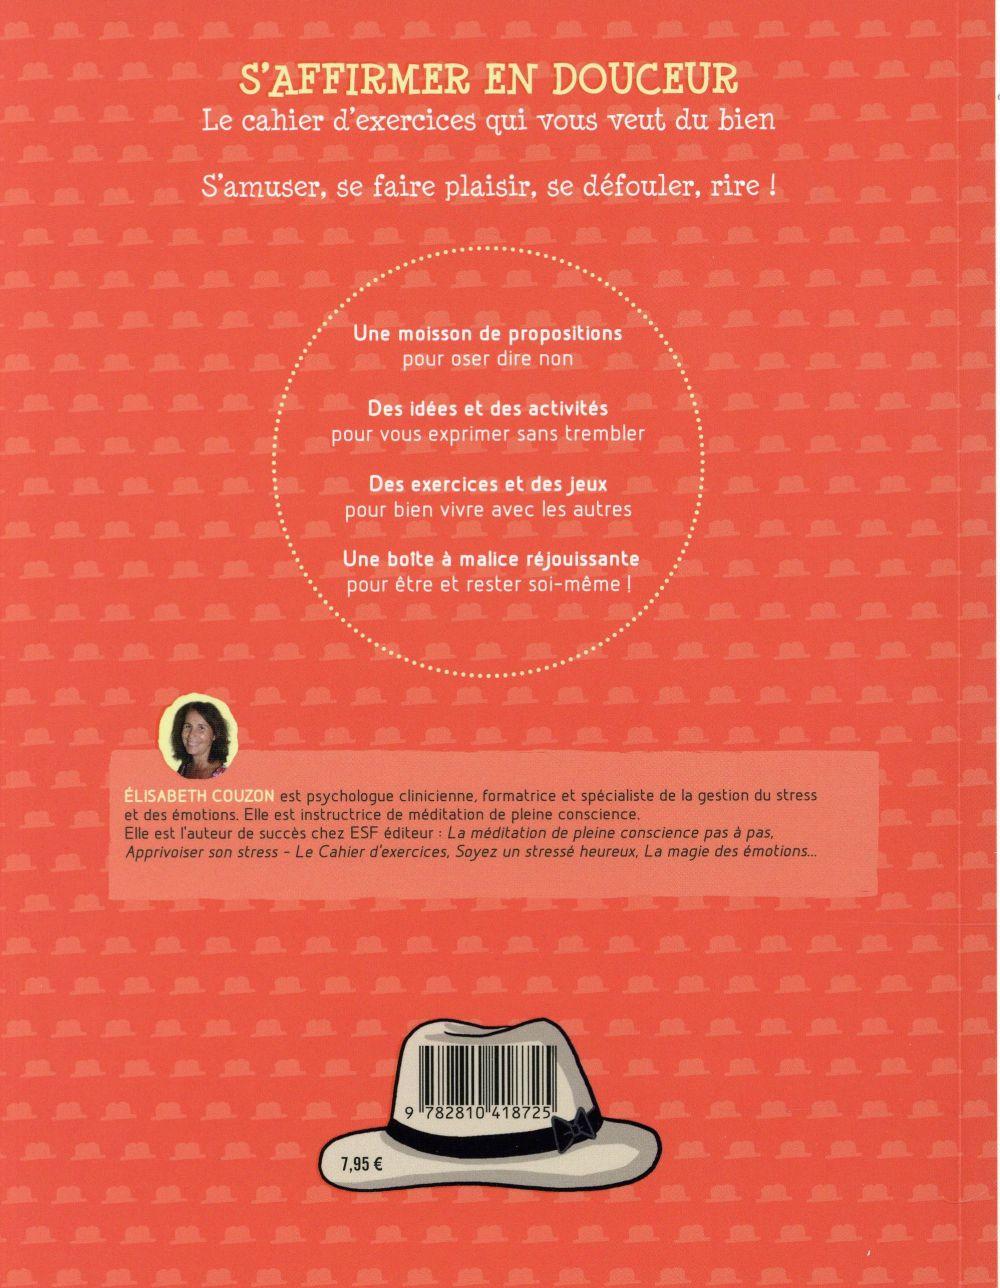 S Affirmer En Douceur Anne Brunet Elisabeth Couzon Esf Prisma Grand Format Le Hall Du Livre Nancy